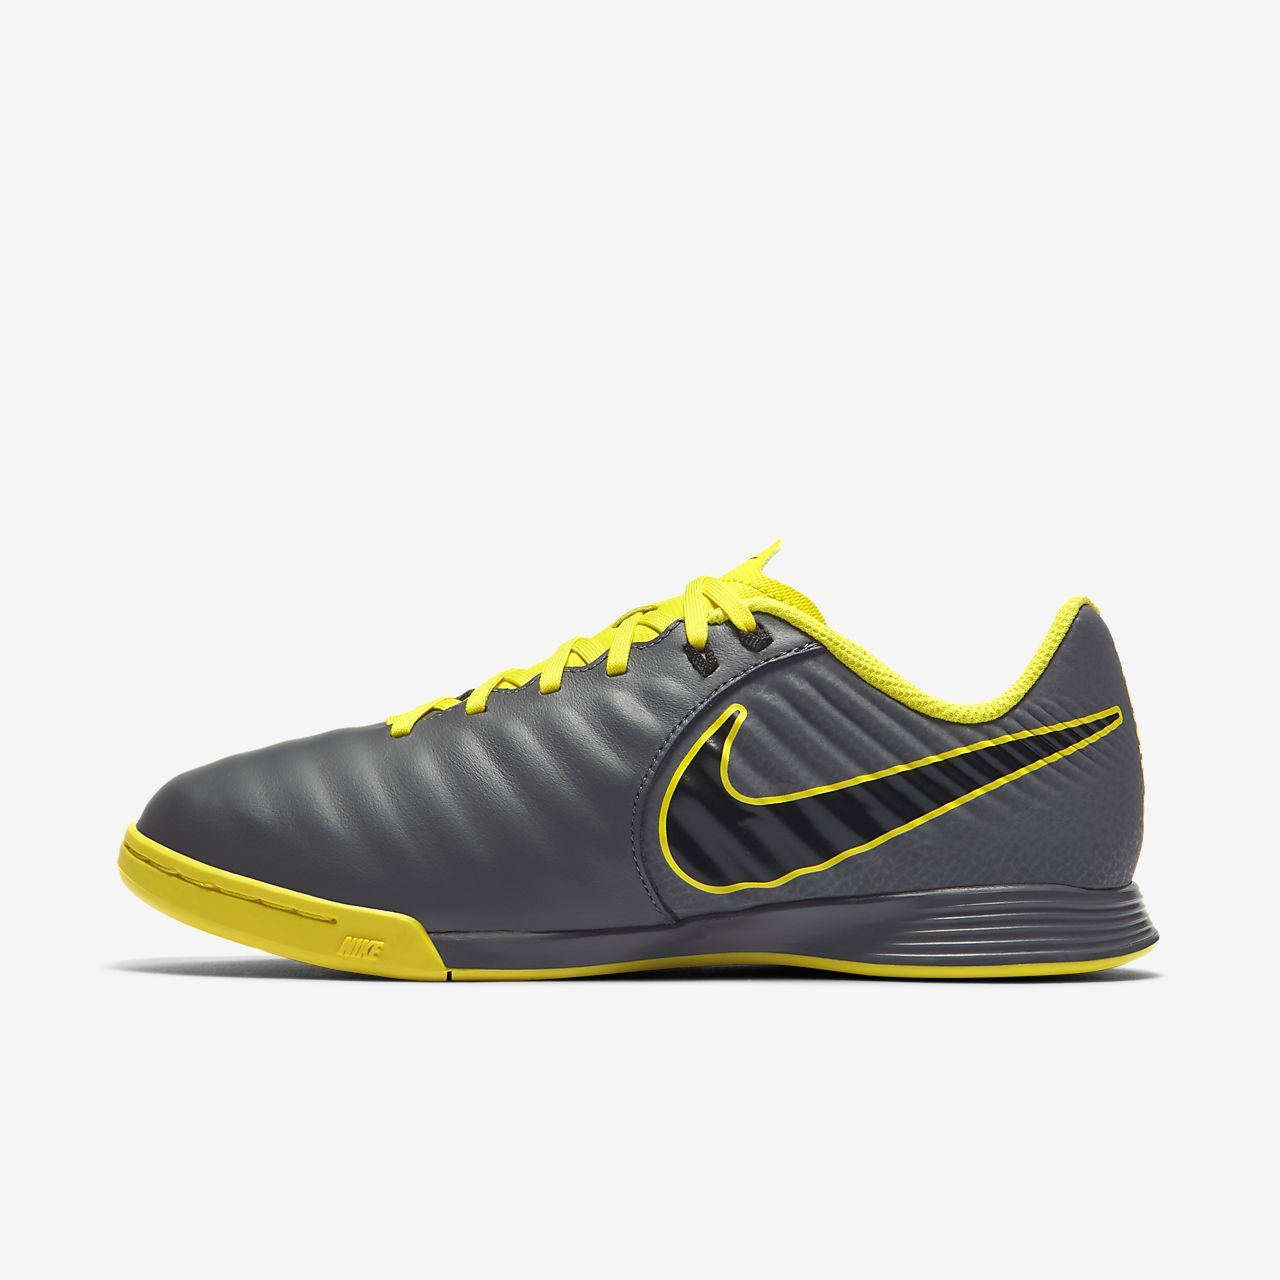 uk availability f2ae4 4fab8 ... Inomhusfotbollssko Nike Jr. Tiempo LegendX VII Academy IC för  barn/ungdom